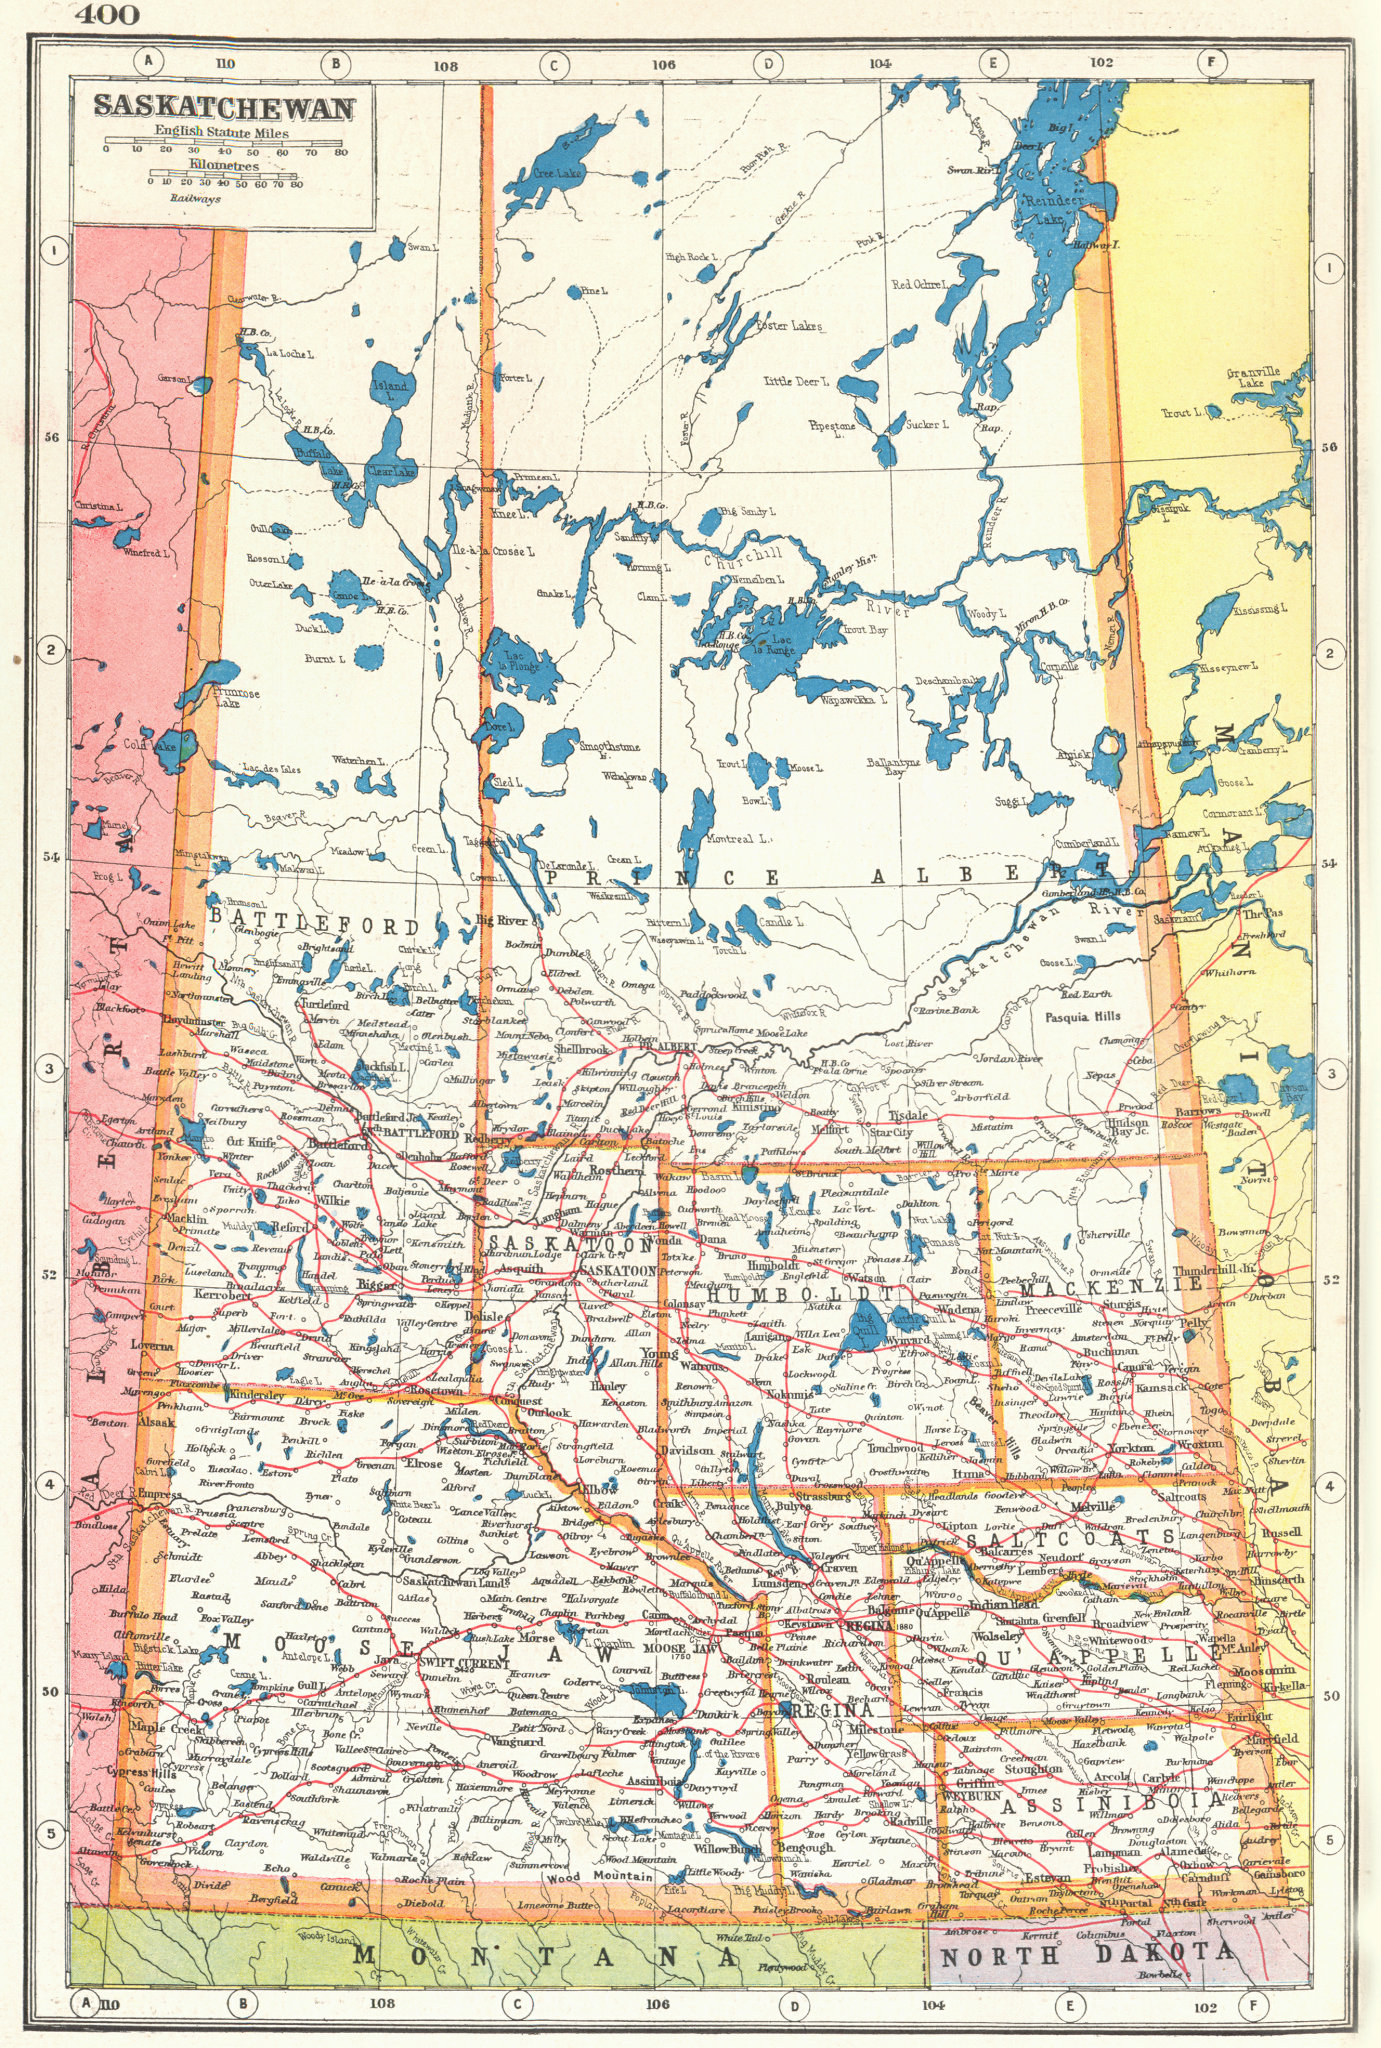 Associate Product SASKATCHEWAN. Showing railways. Canada. HARMSWORTH 1920 old antique map chart